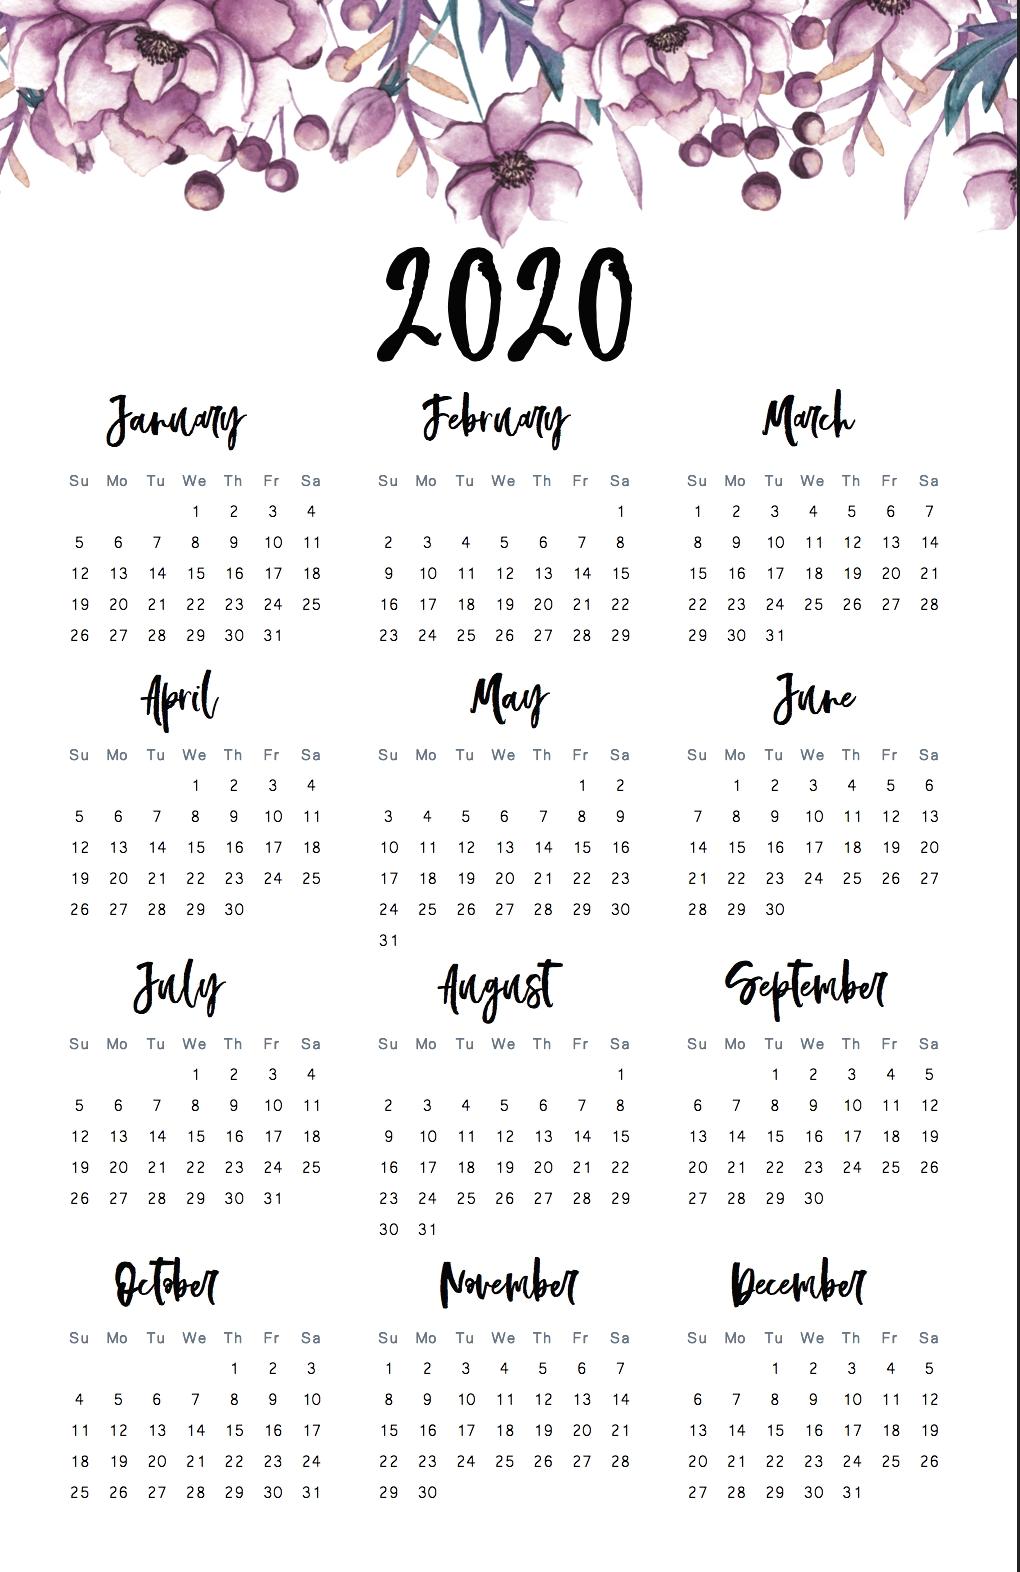 Calendar 2020 Aesthetic - Google Search In 2020 | Print